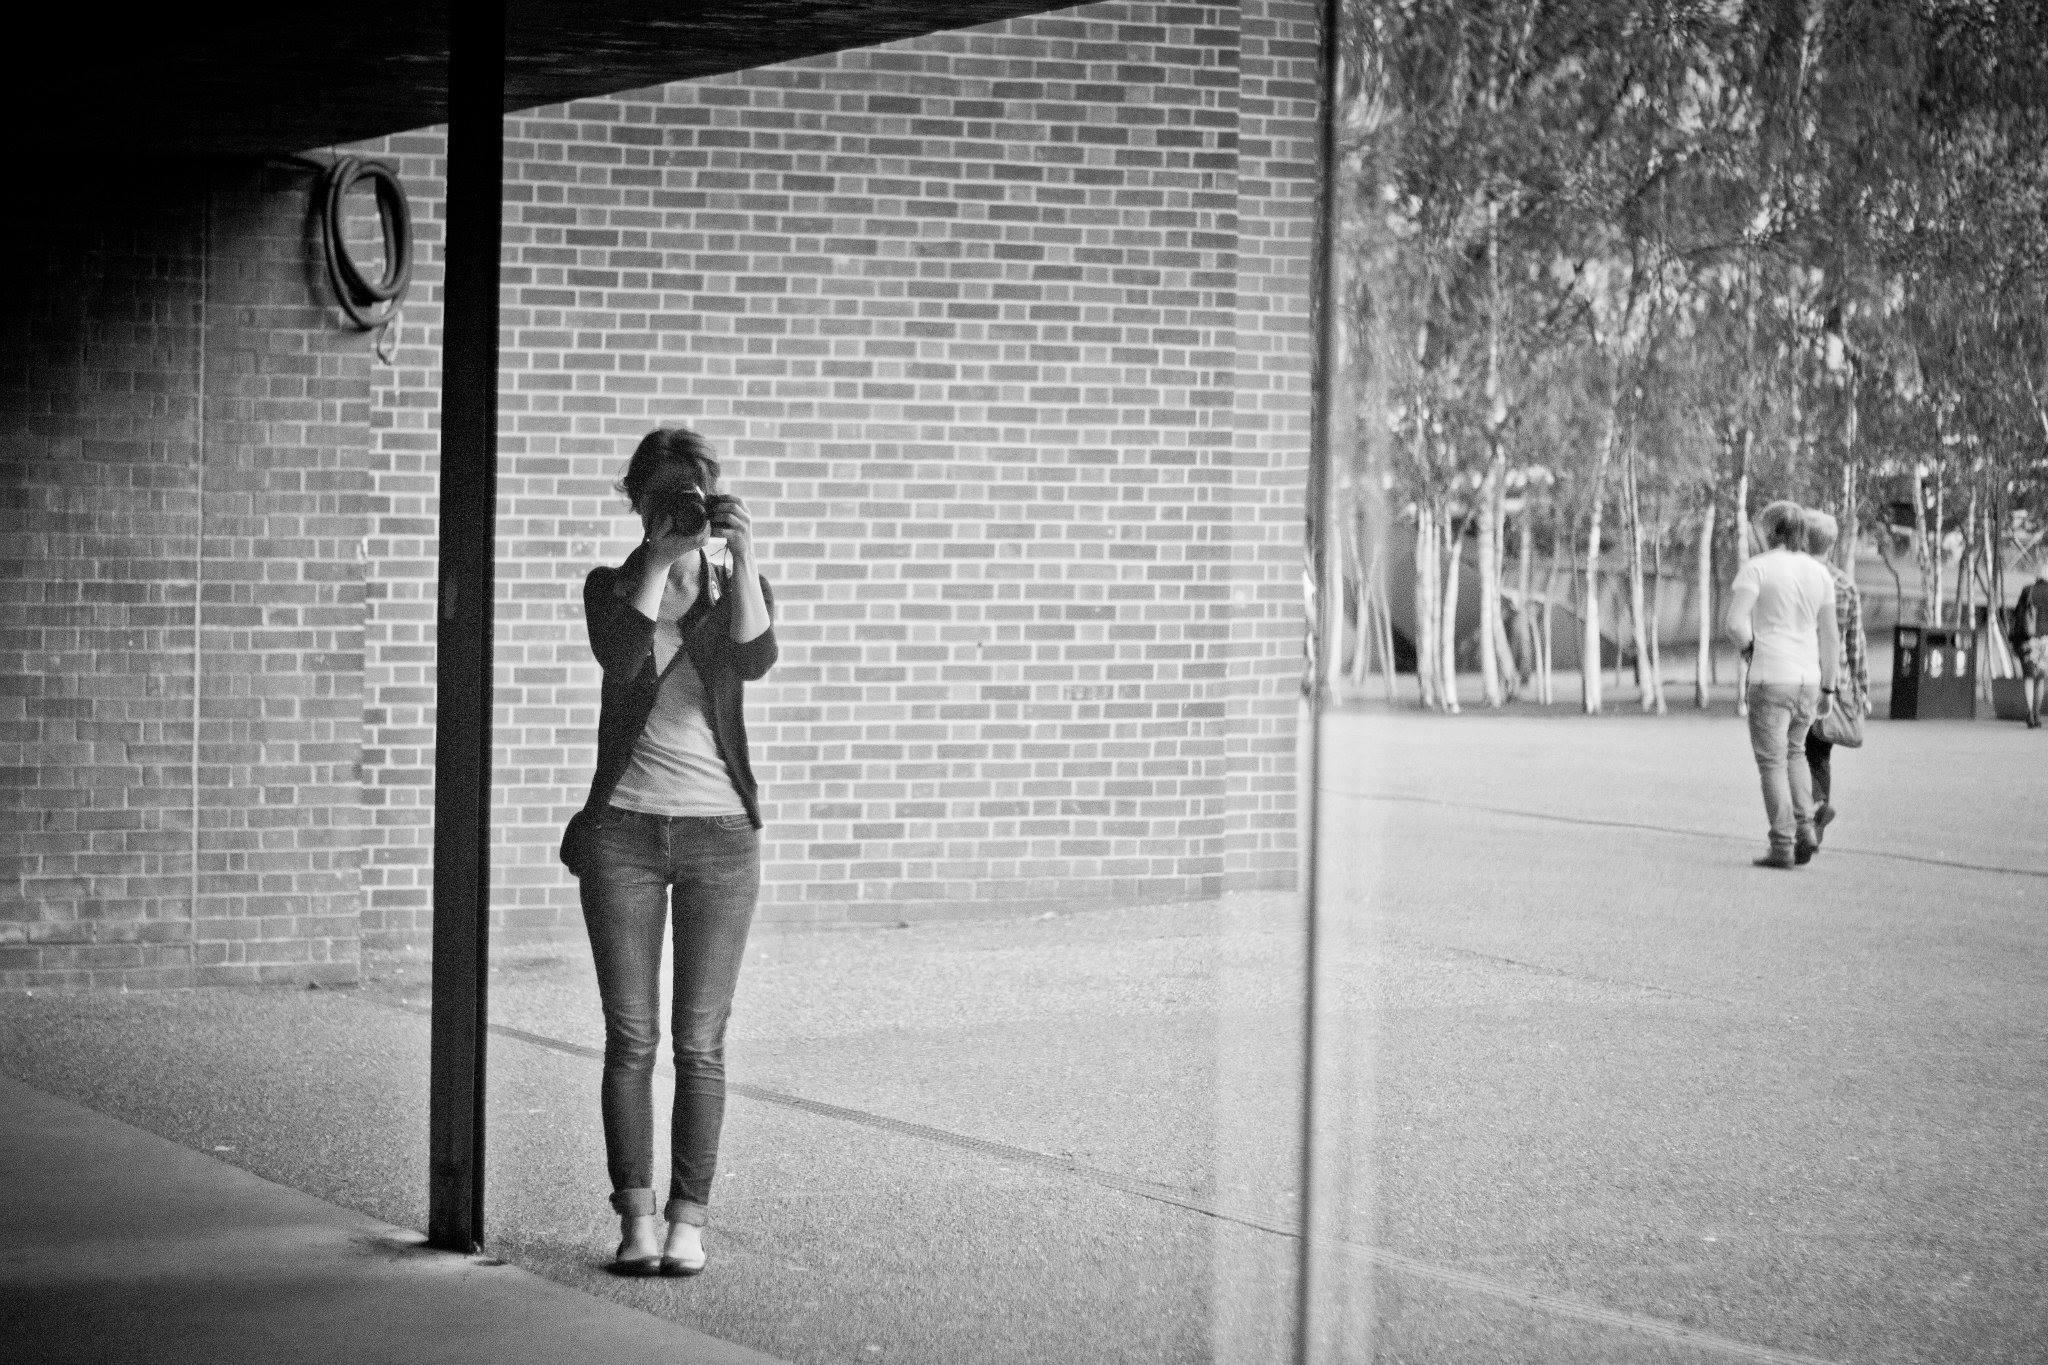 London_-_Reflection.jpg